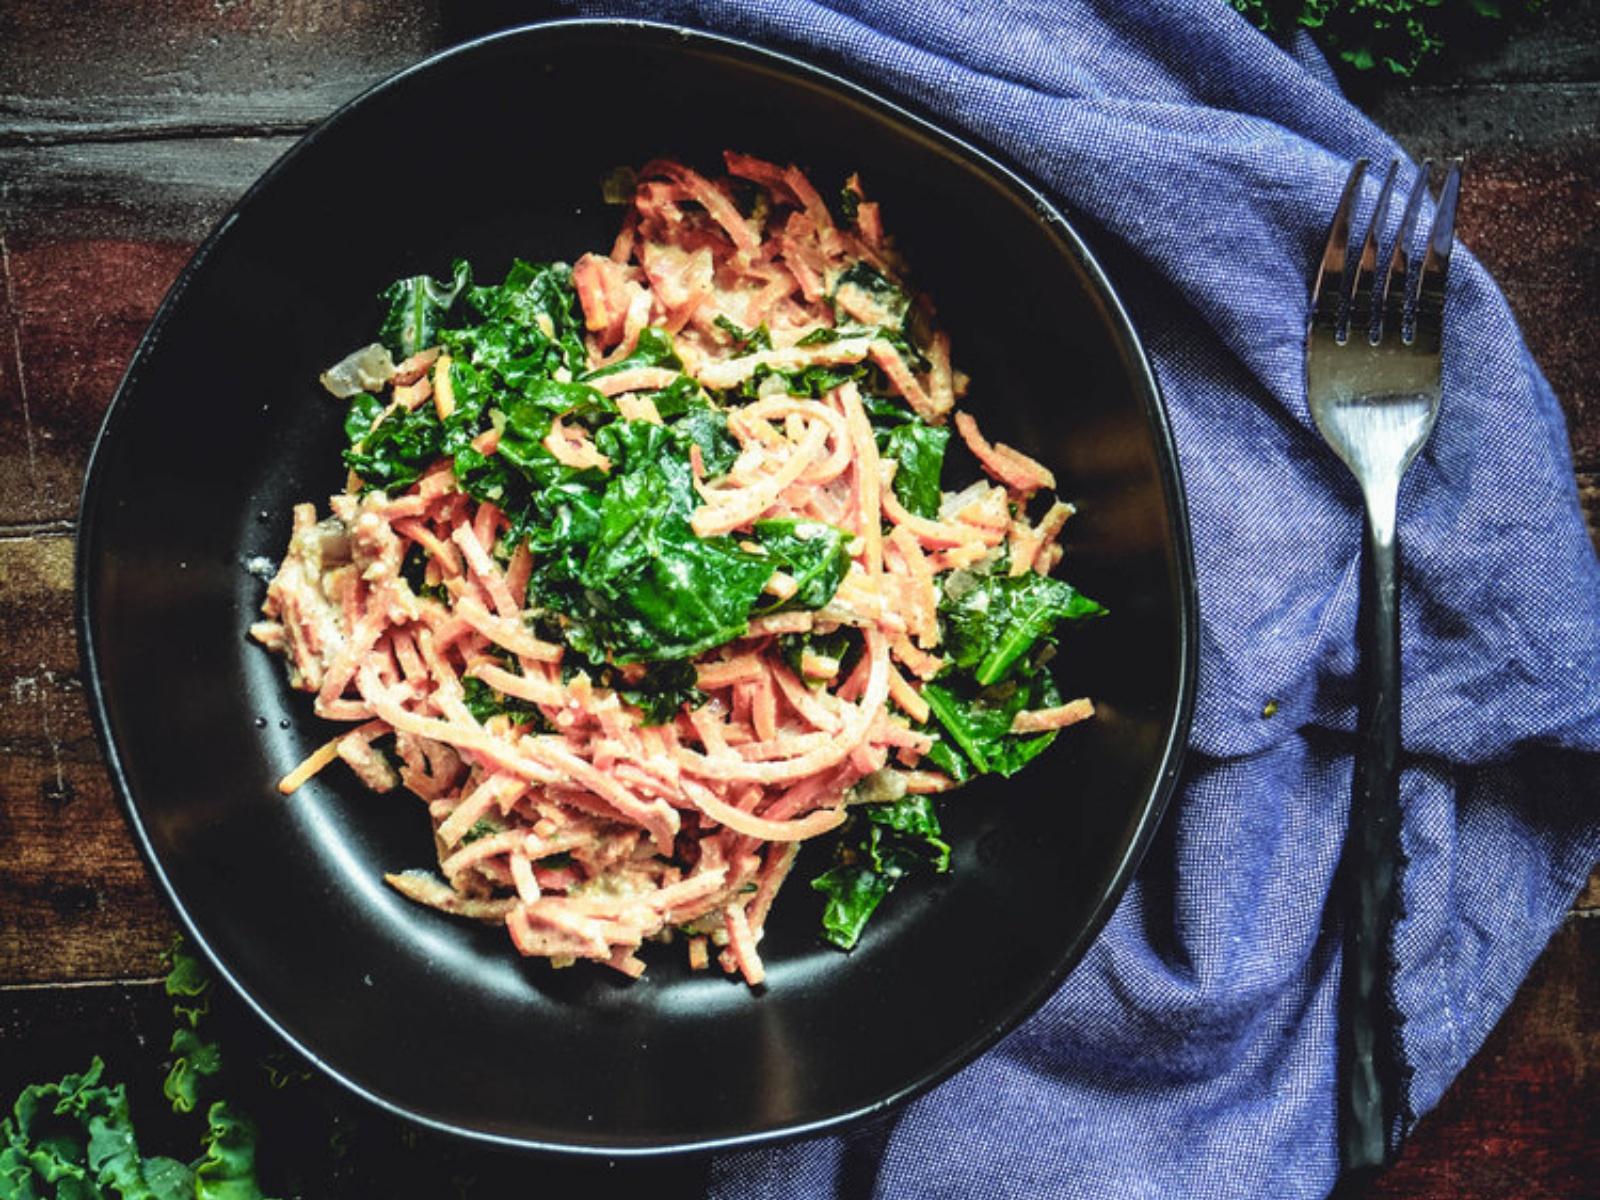 Sweet Potato Noodles with Kale and Walnut Sage Sauce